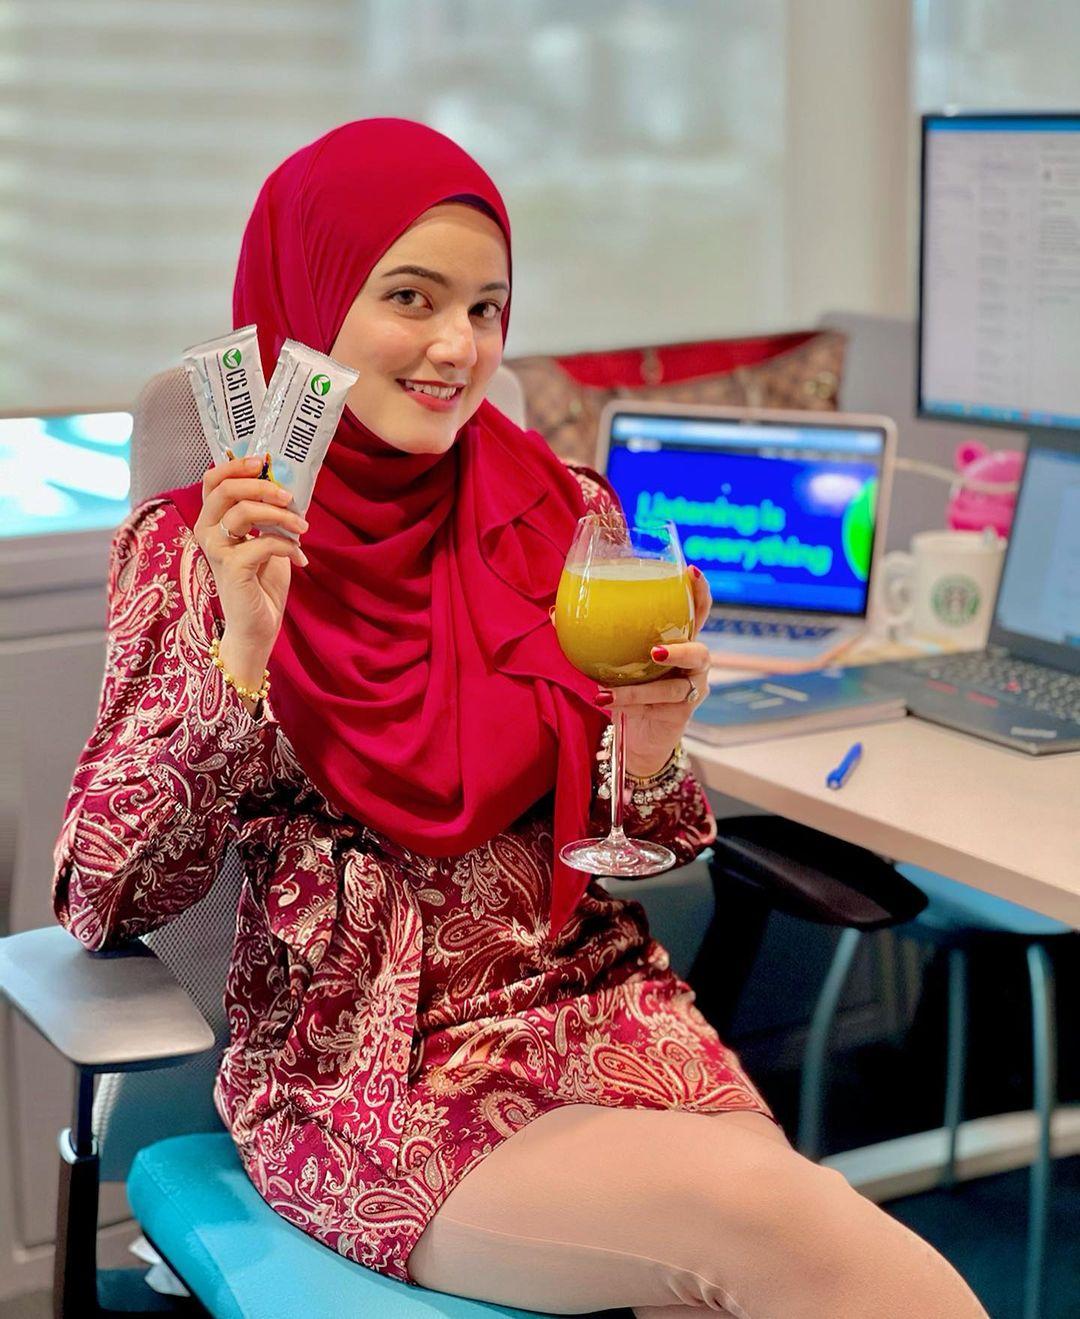 MGI Wellness CG Fiber